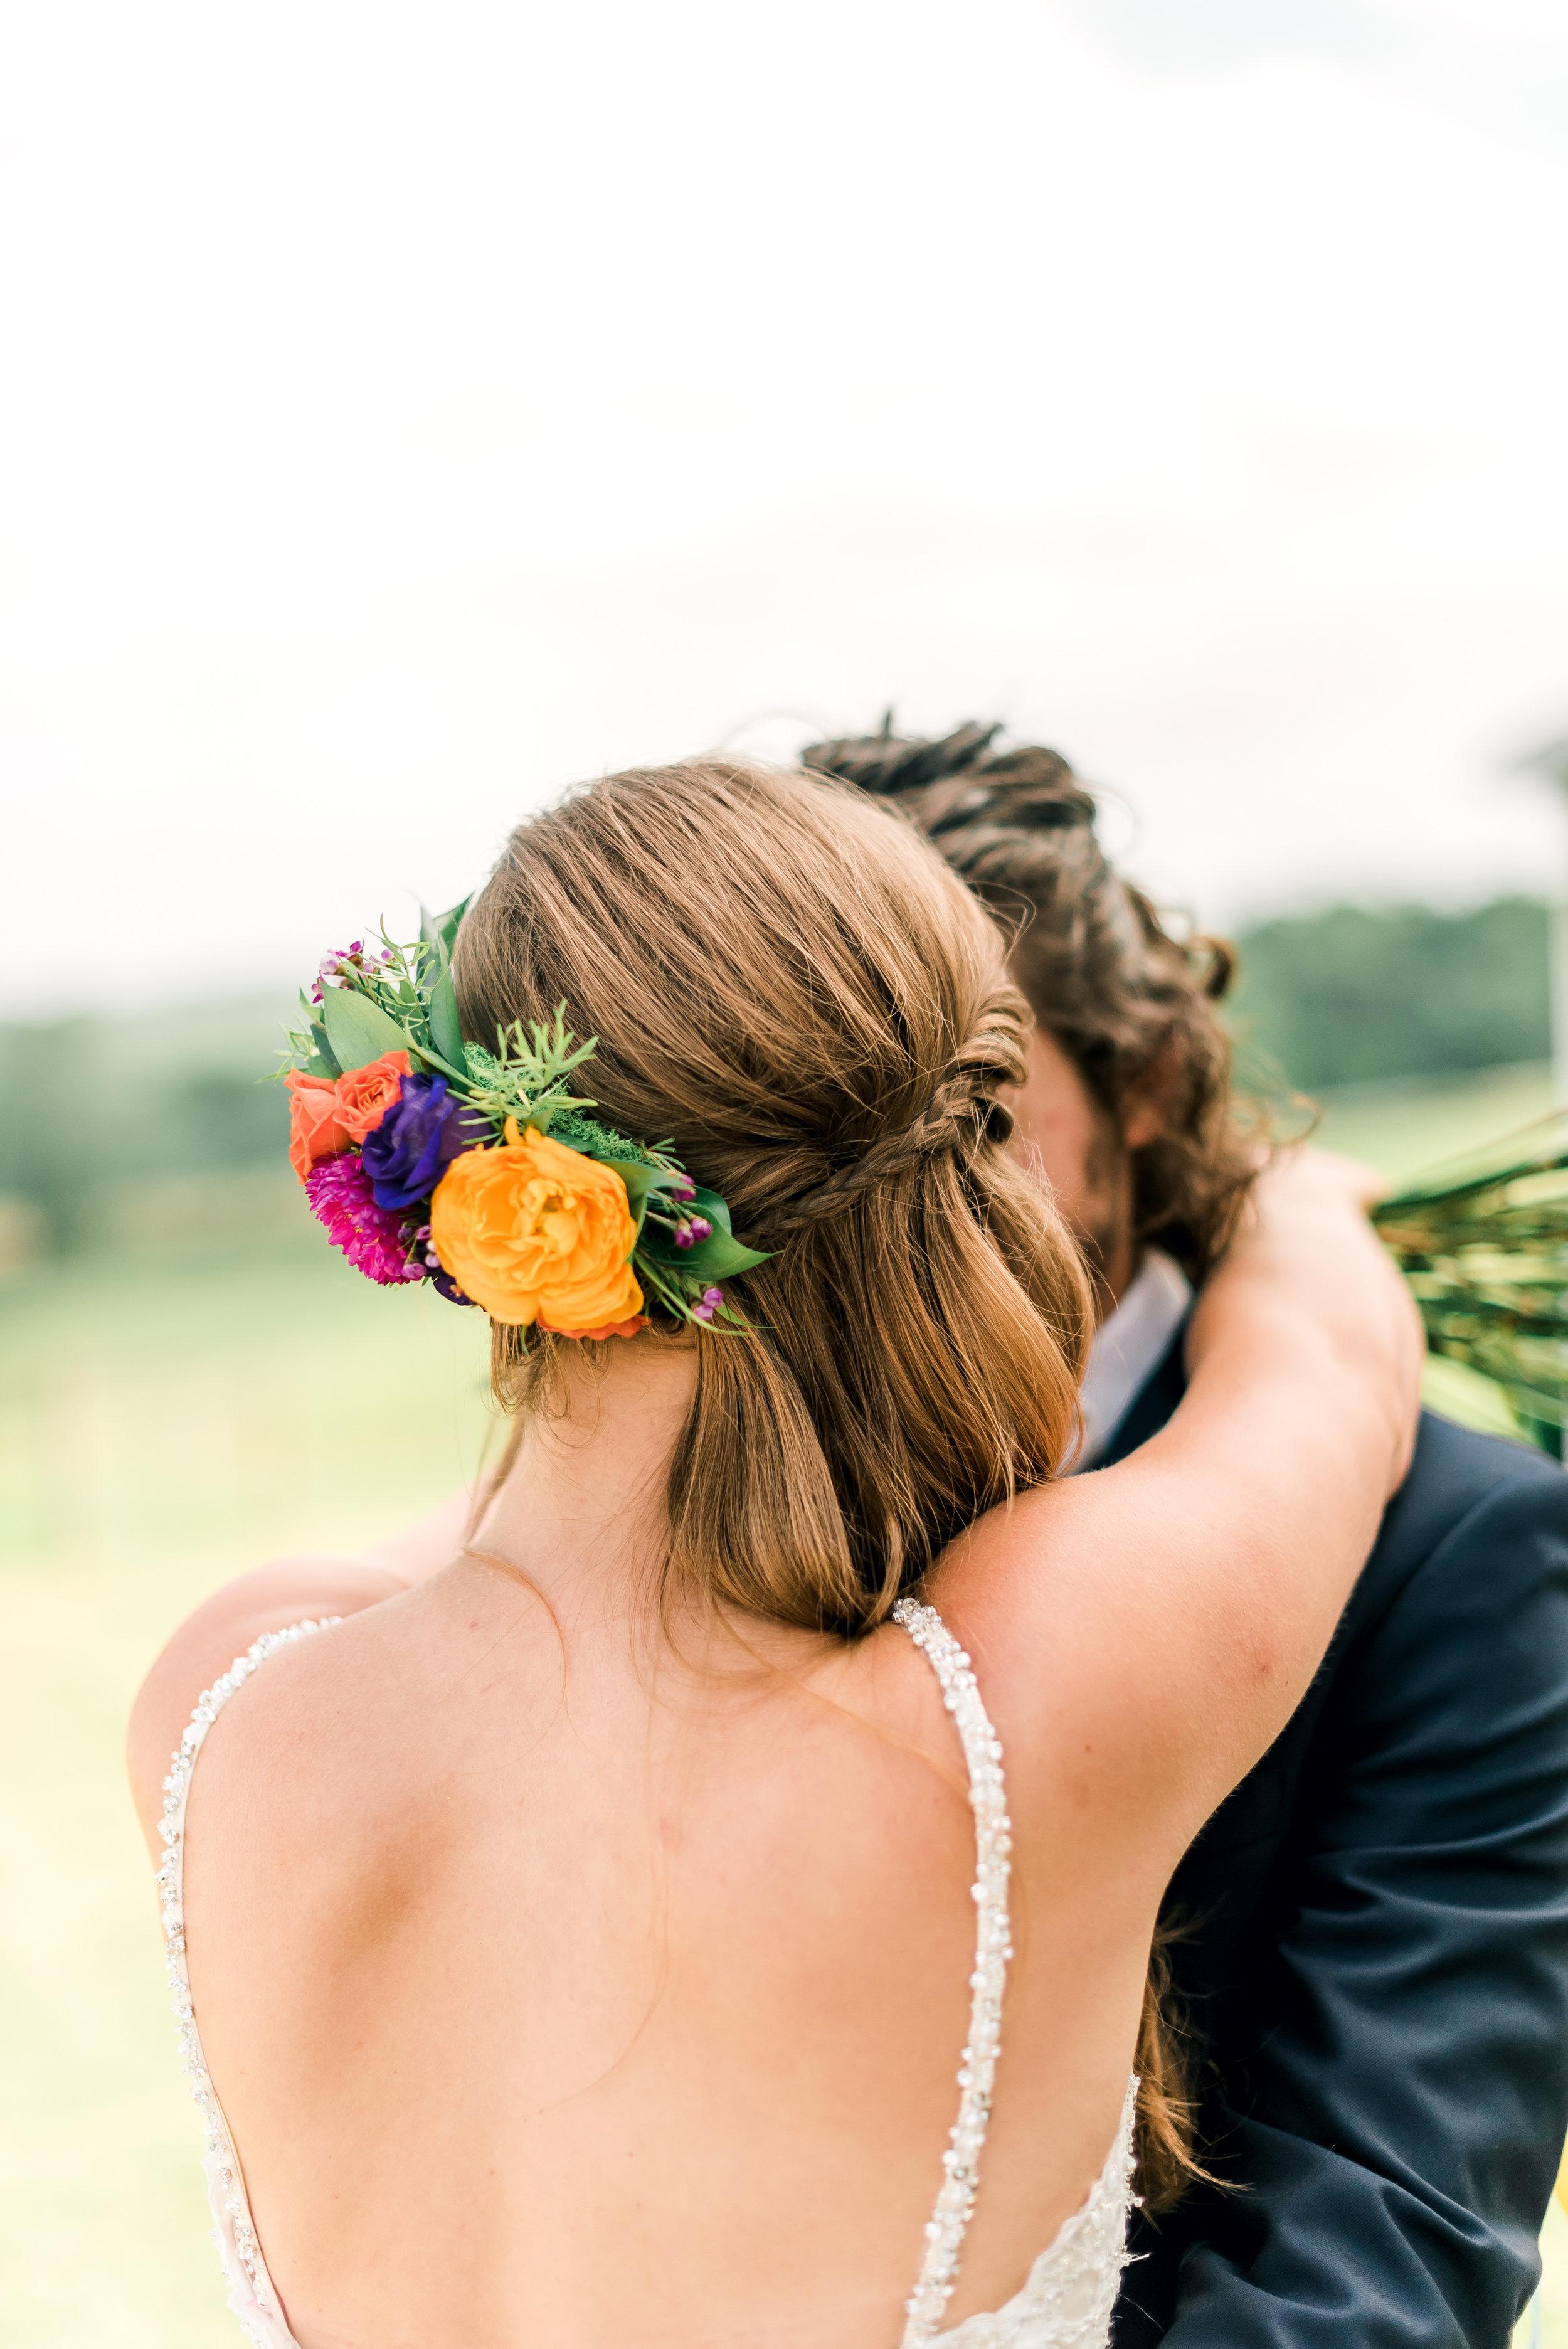 Bohemian-Updo-with-Flowers.jpg